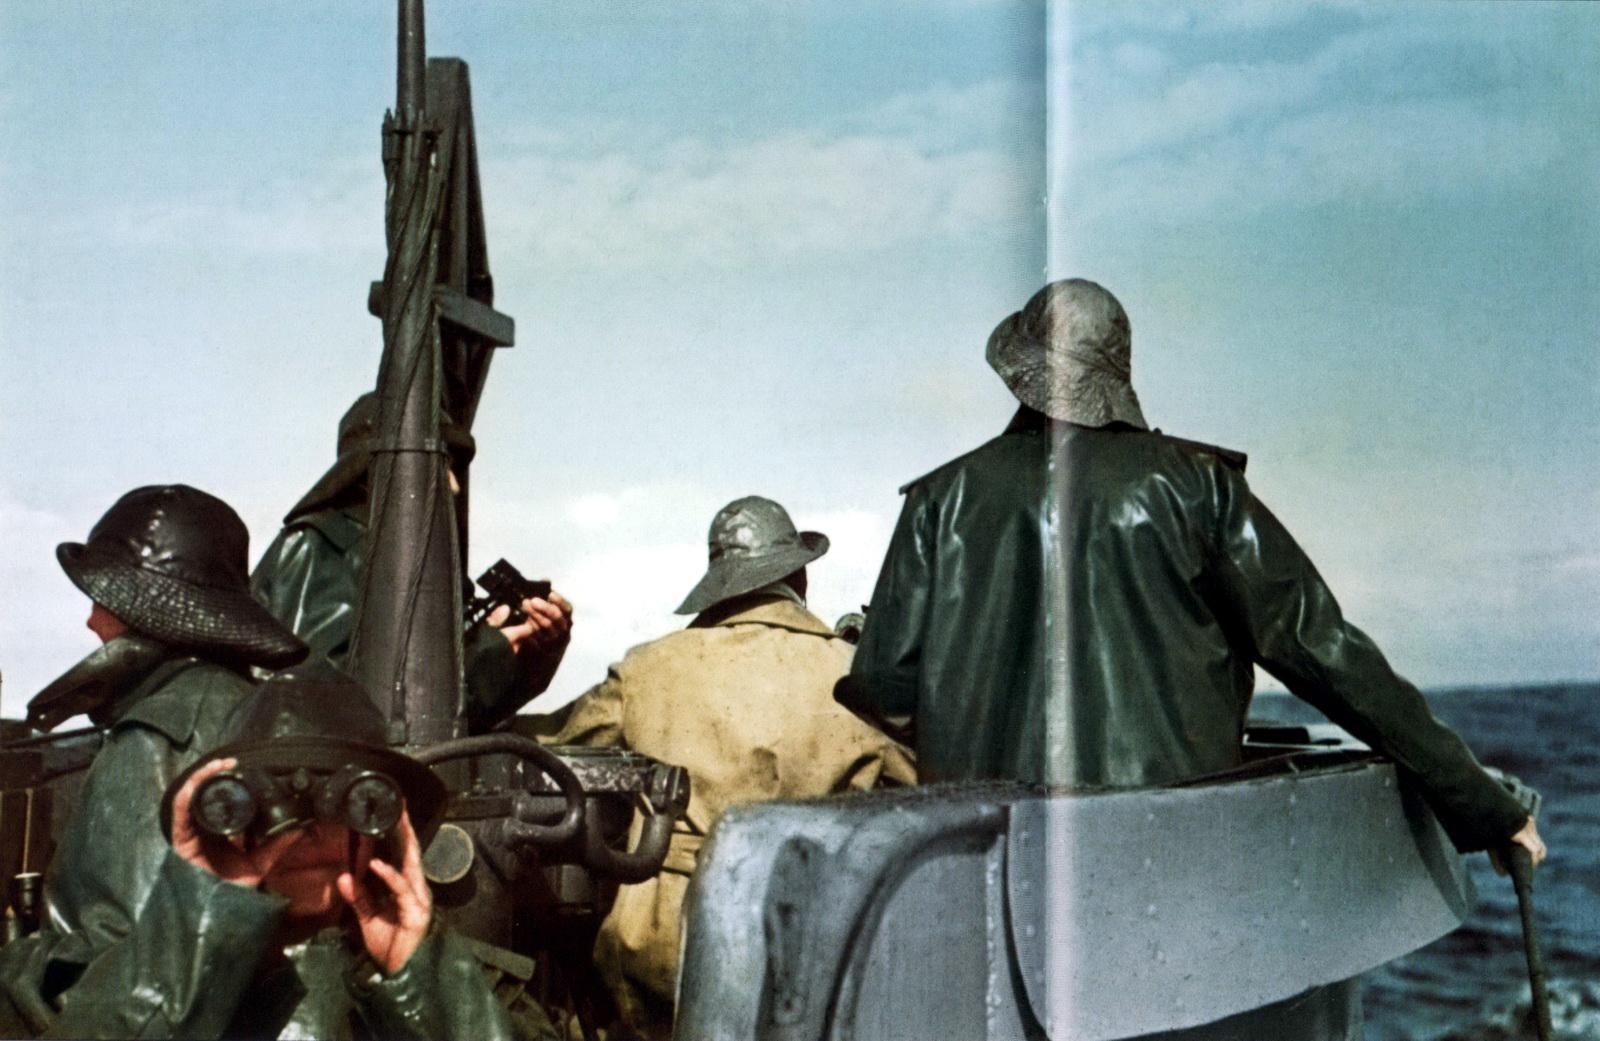 12 farbe farb german kriegsmarine submarine u-boat lookouts bridge watch conning tower.jpg